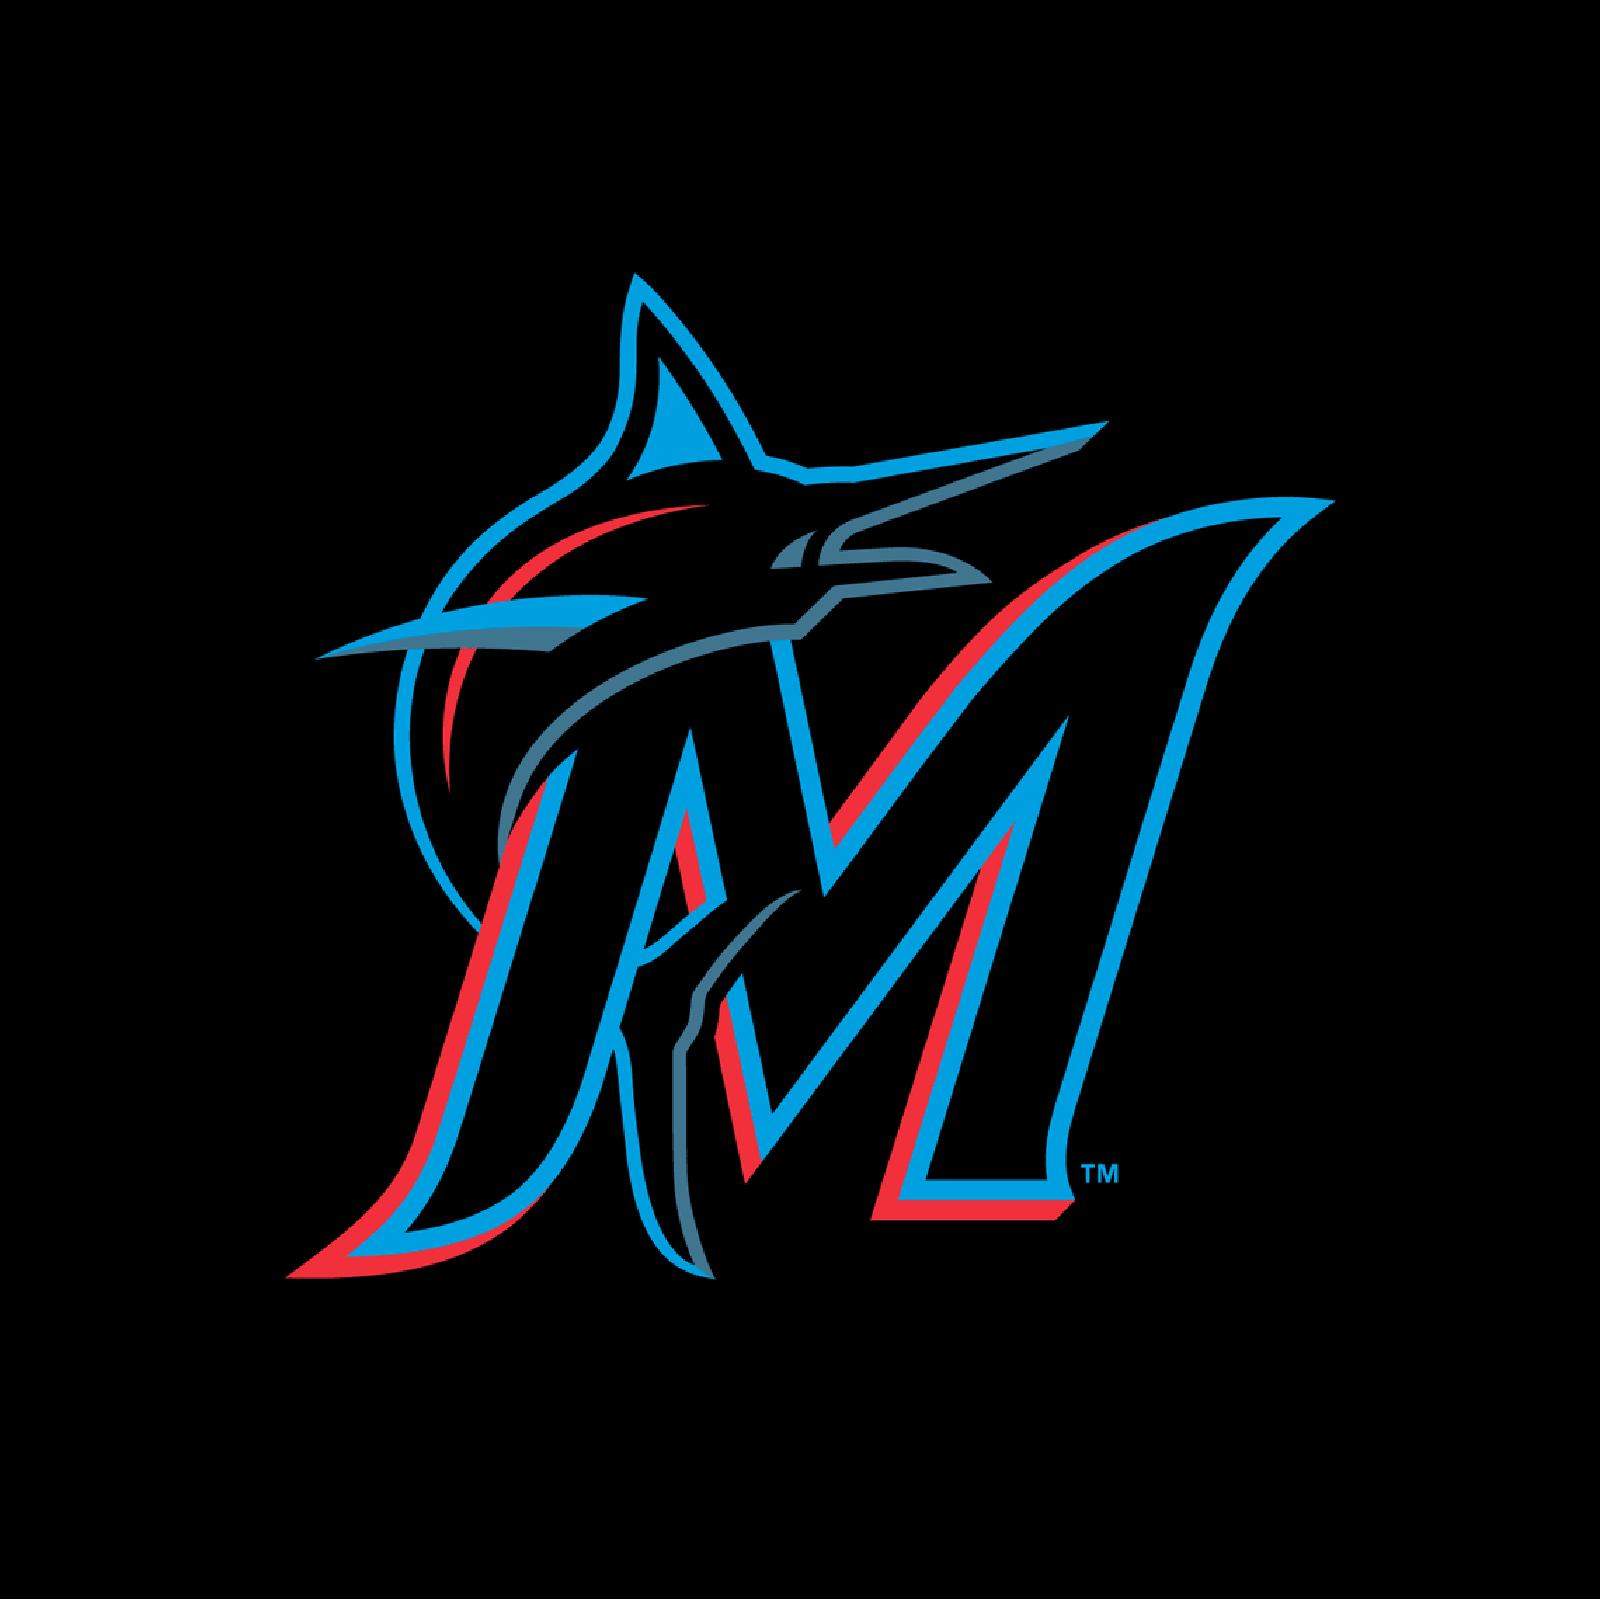 Miami Marlins迈哈密马林鱼棒球联盟启动新LOGO-VI设计3